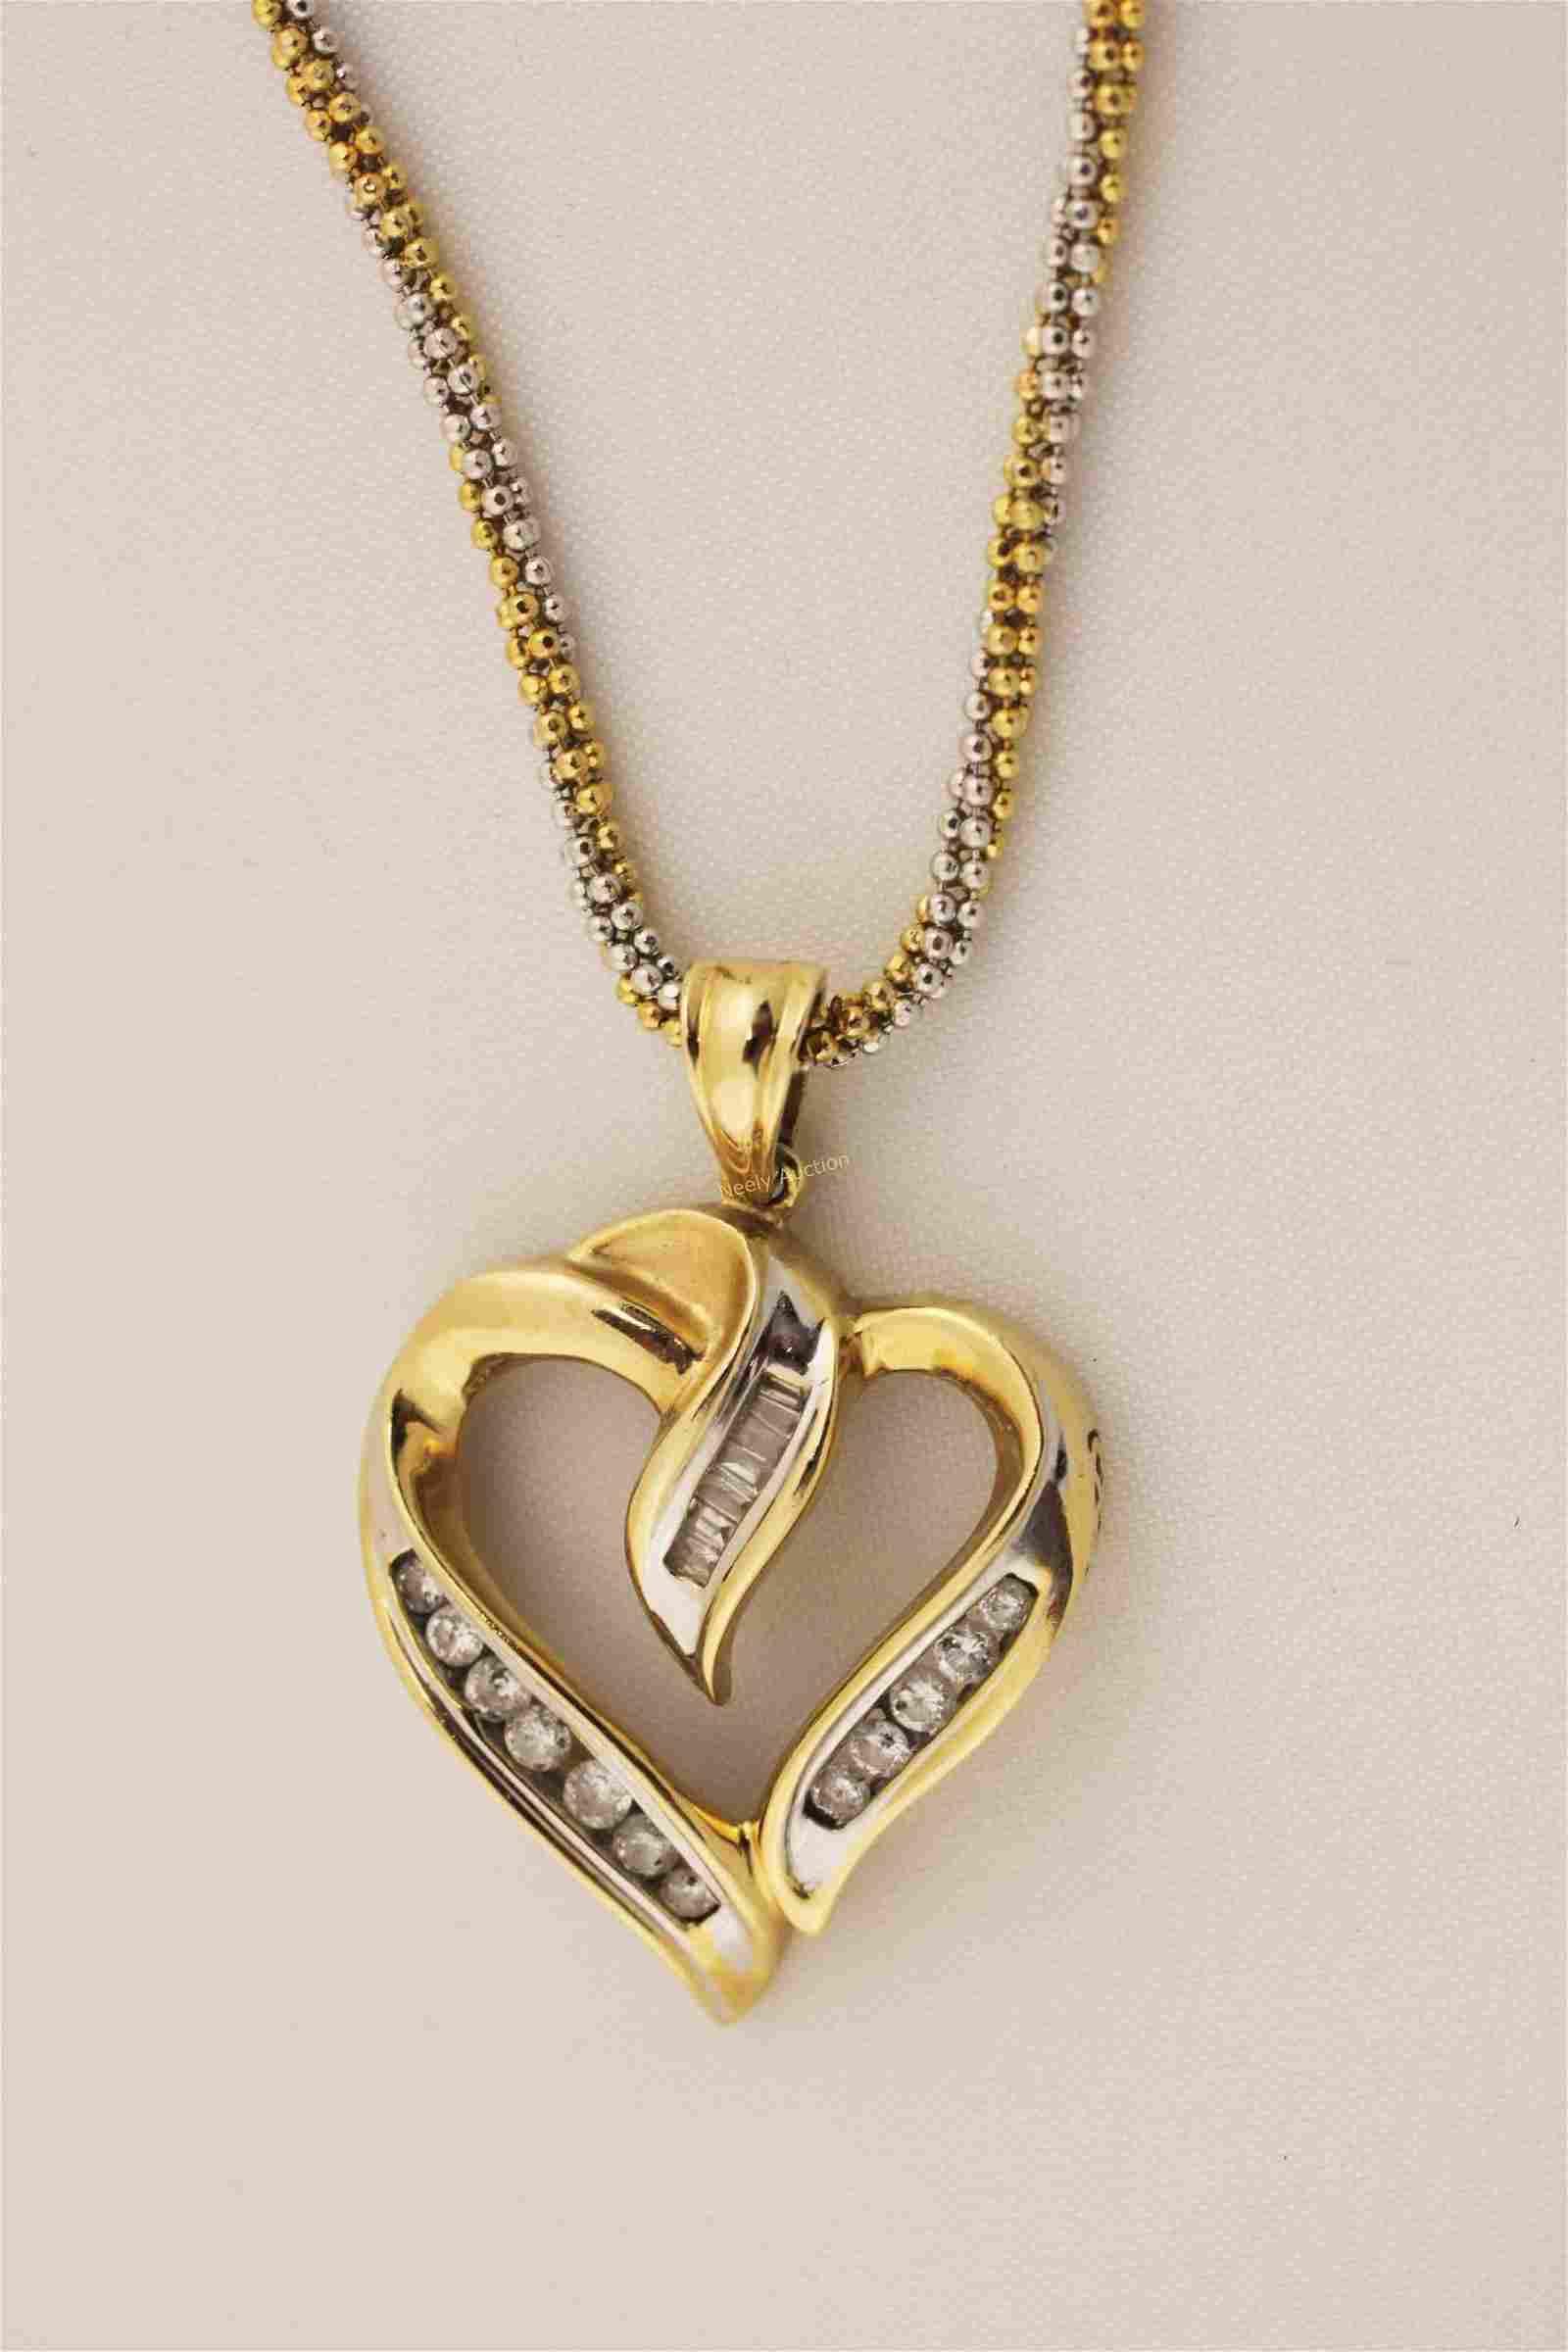 14K Gold w Diamond Heart Shape Pendant Necklace